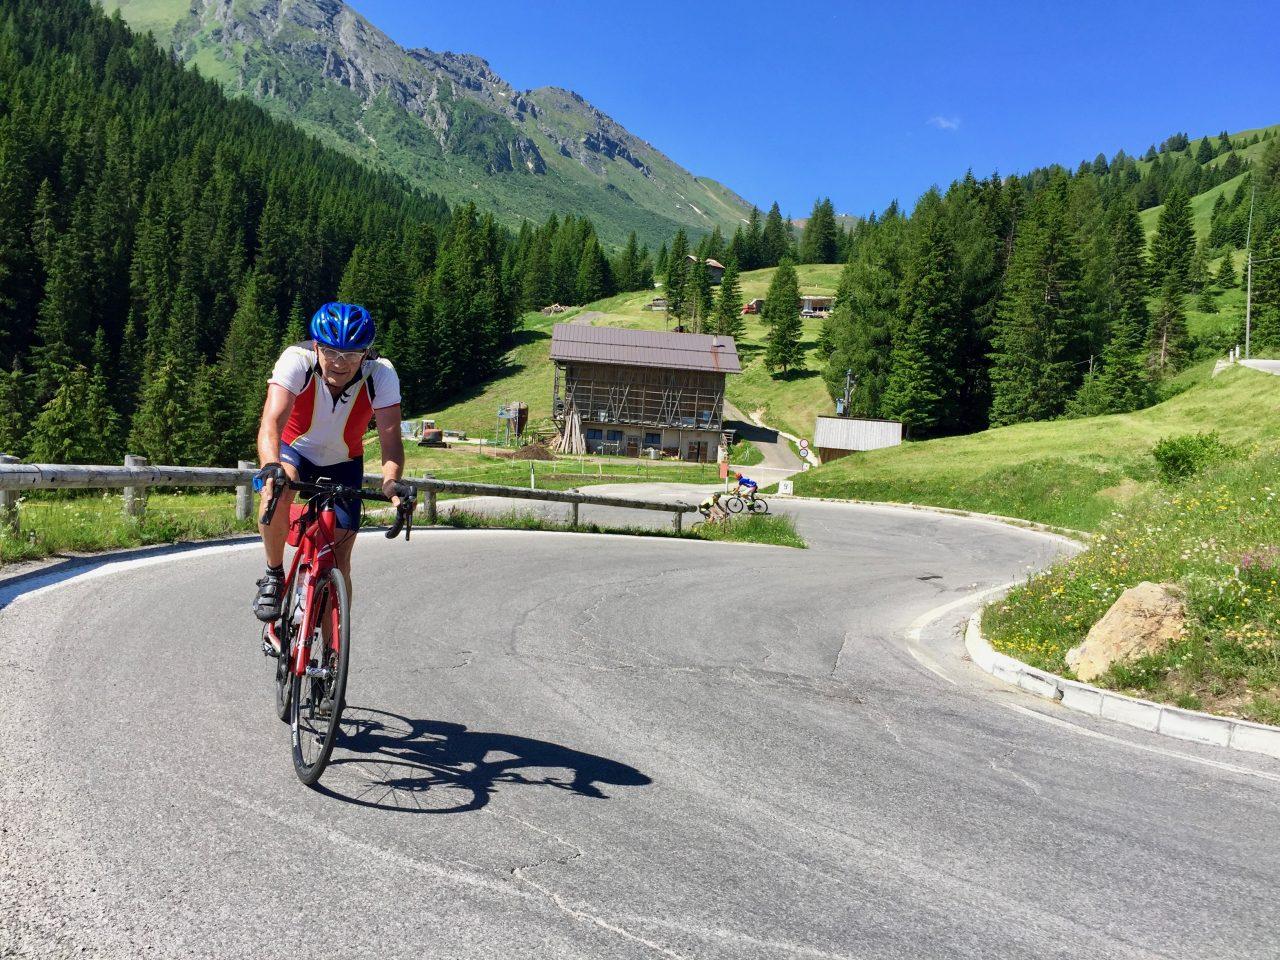 Hans-Jörg, Auffahrt Passo Pordoi, Dolomites, Italy